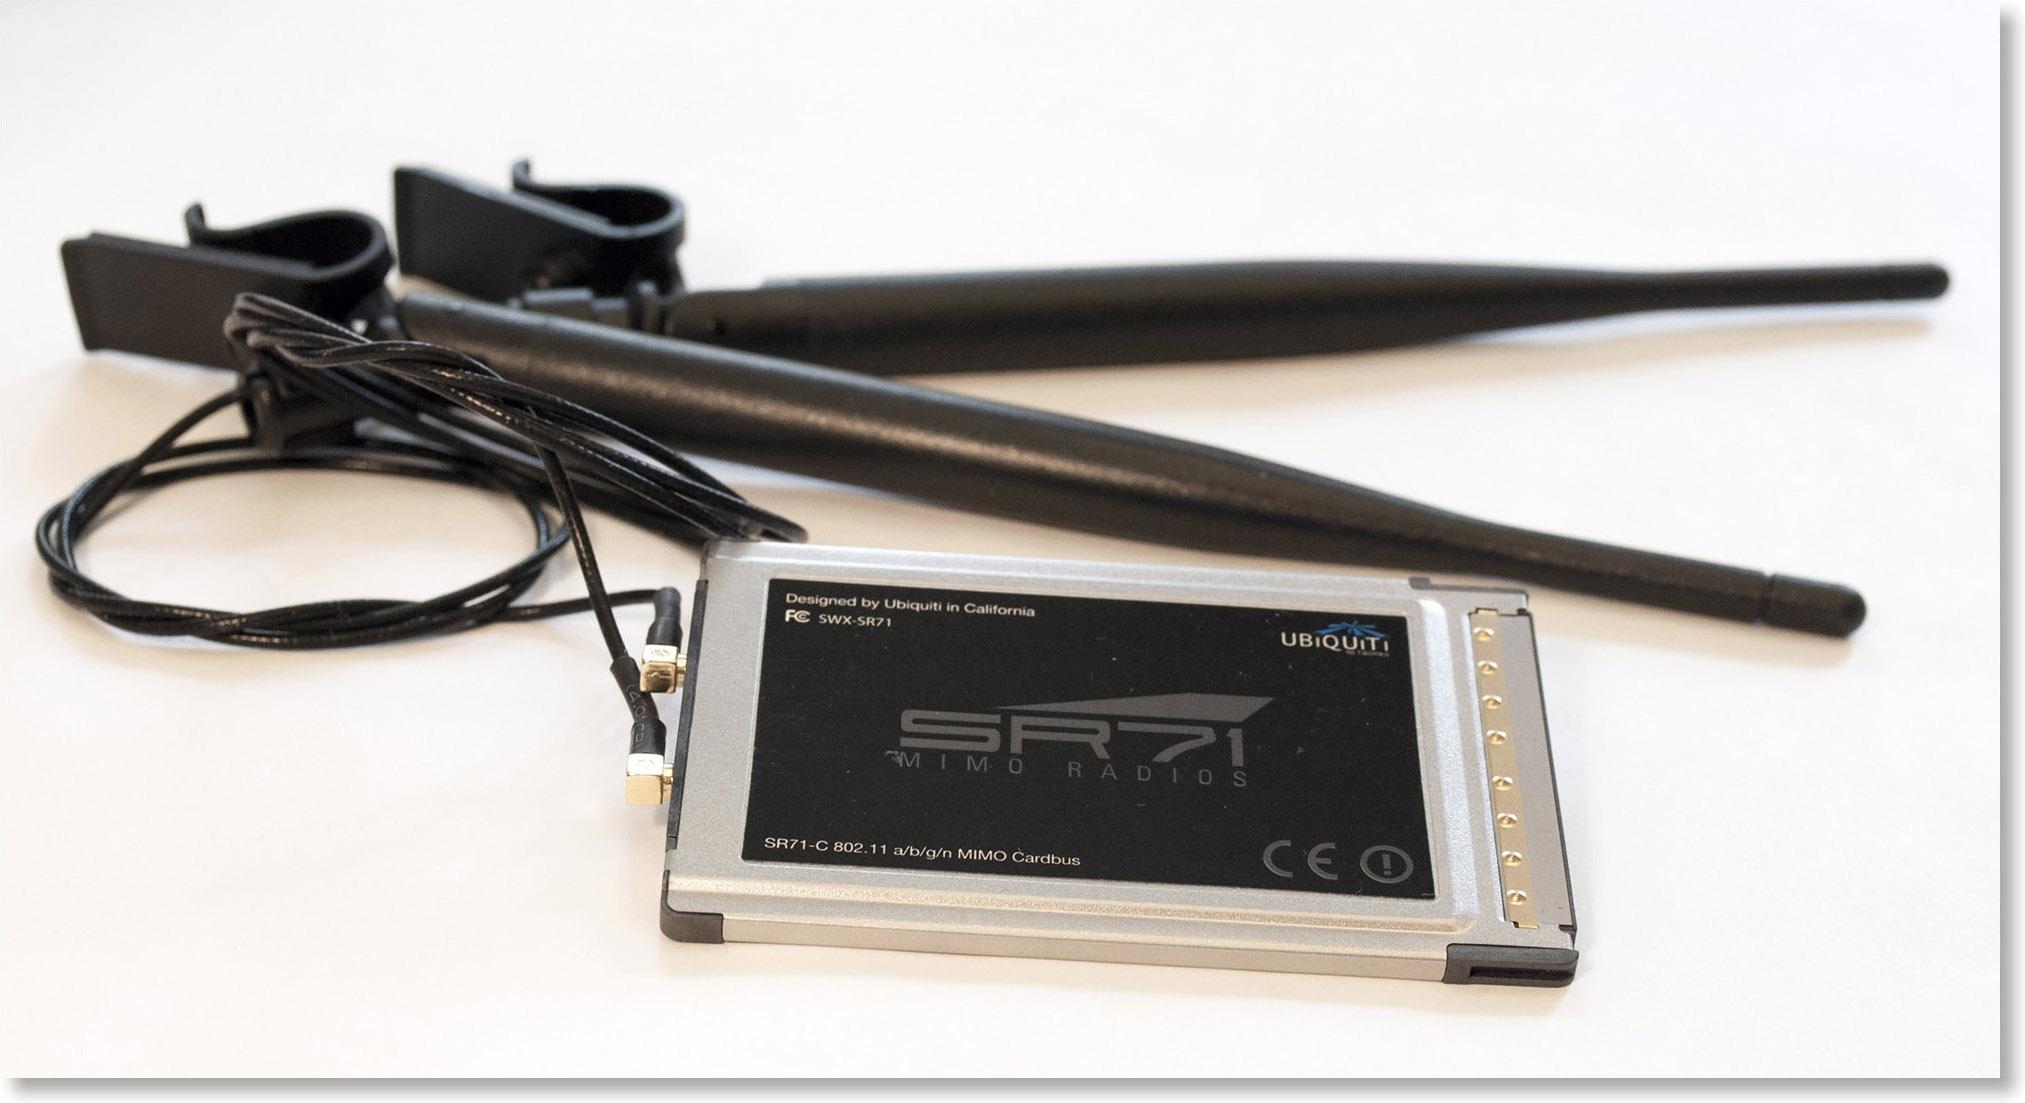 Wi-Fi-адаптер CardBus с внешним антеннами